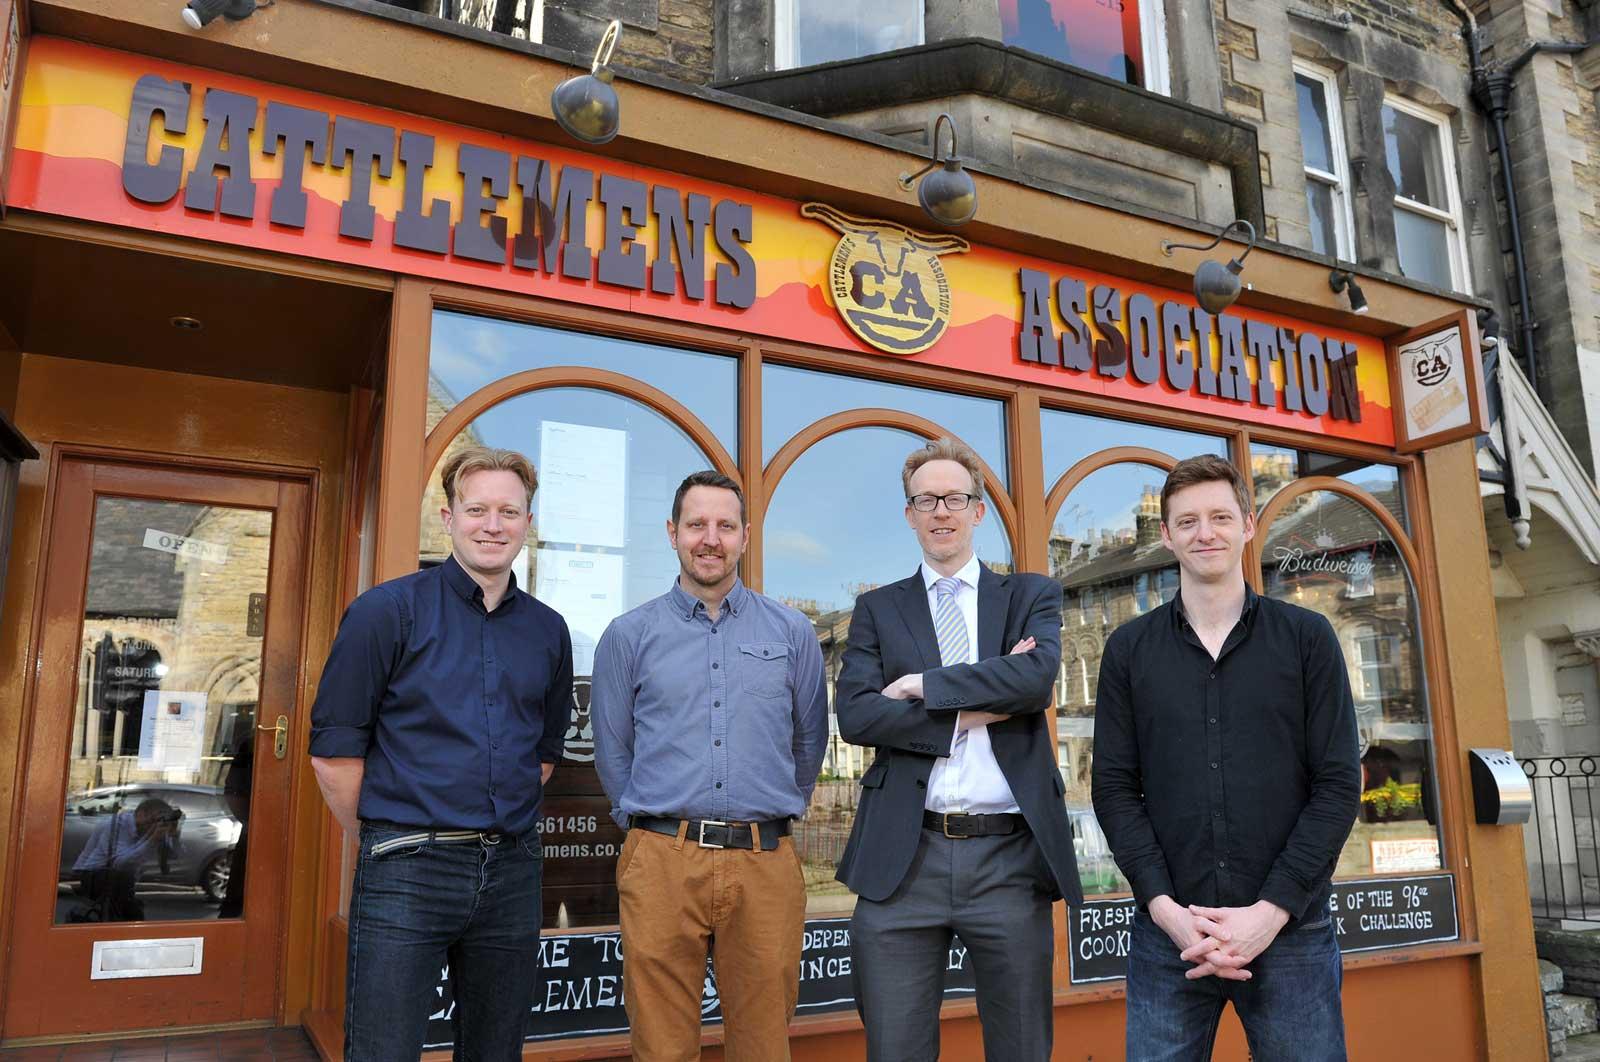 Cattlemens-left-to-right-Andrew-Buckley-Paul-Waddington-Russell-Burnett-Robert-Watson.jpg